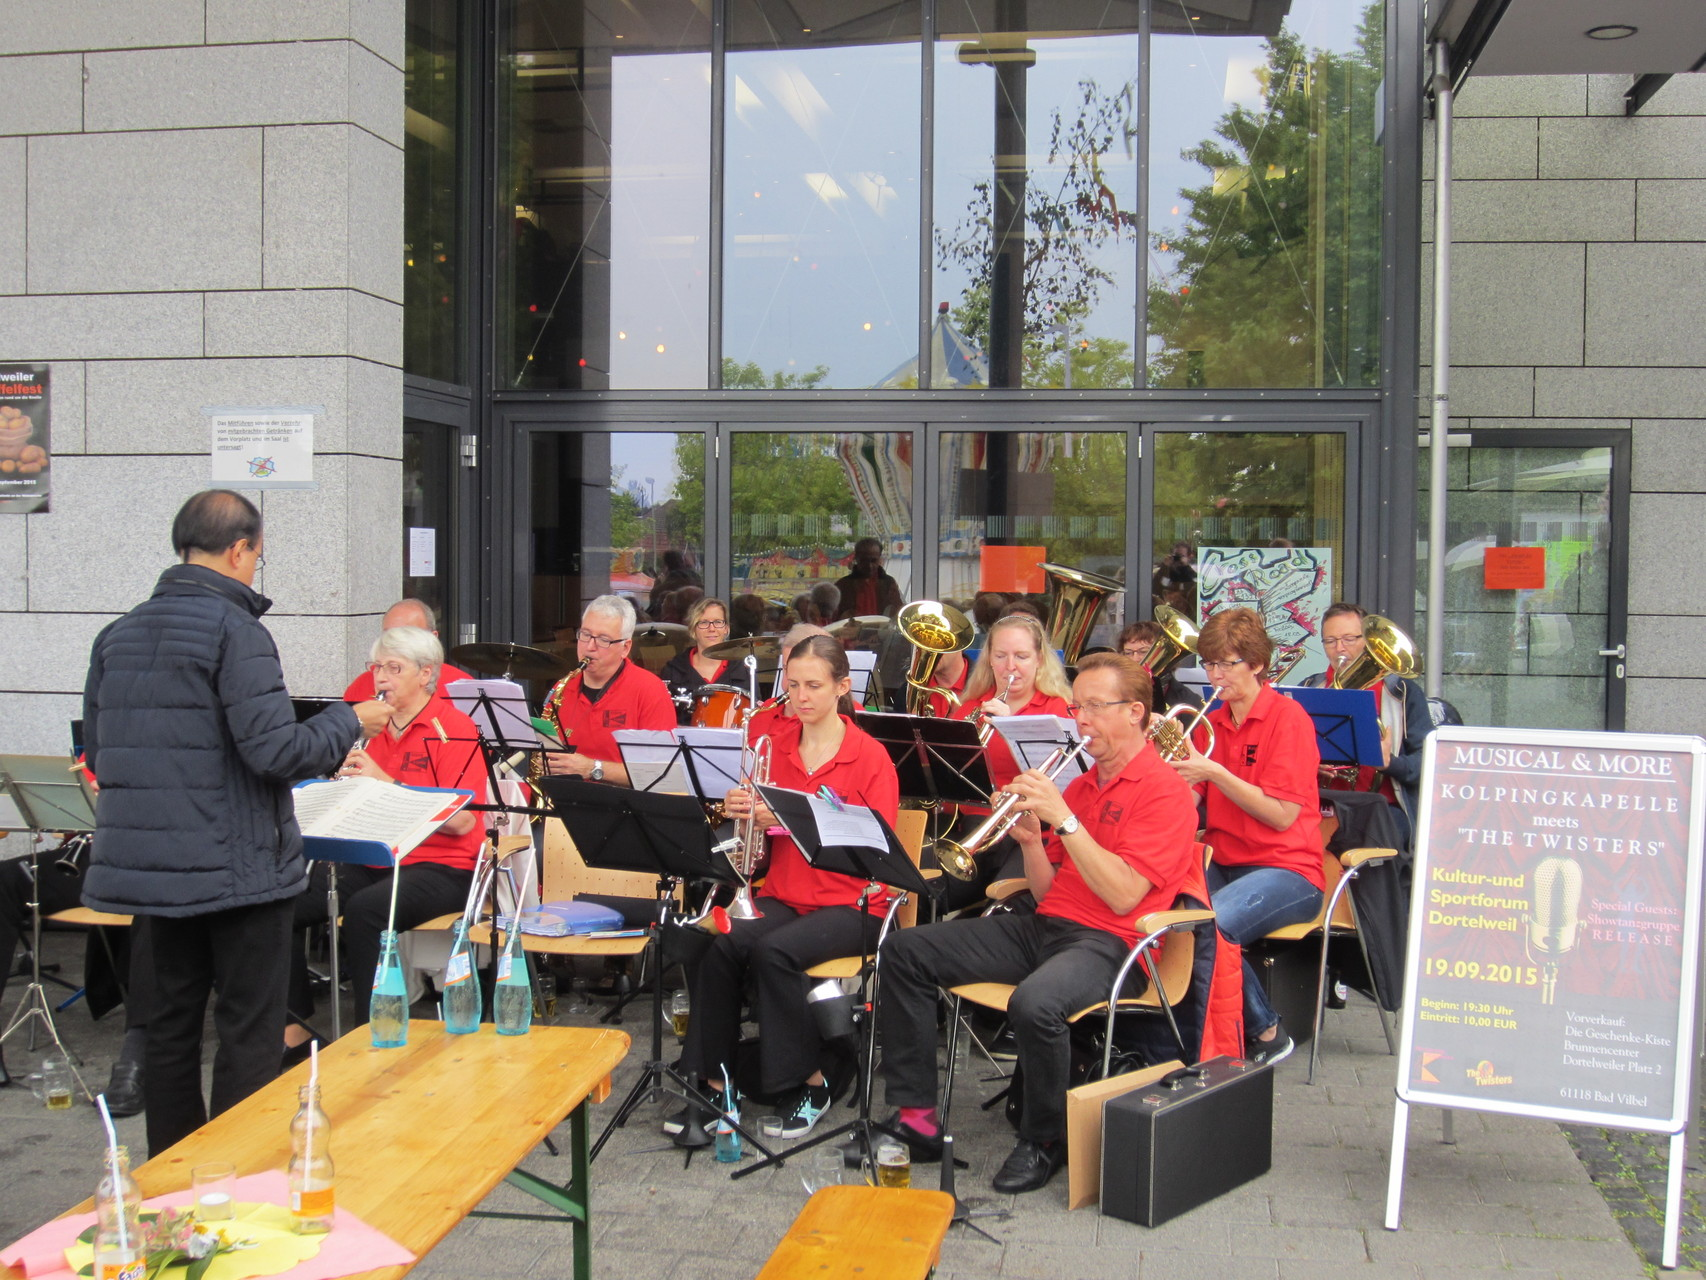 Musikalischer Frühschoppen am 13.09.2015 in Bad Vilbel-Dortelweil